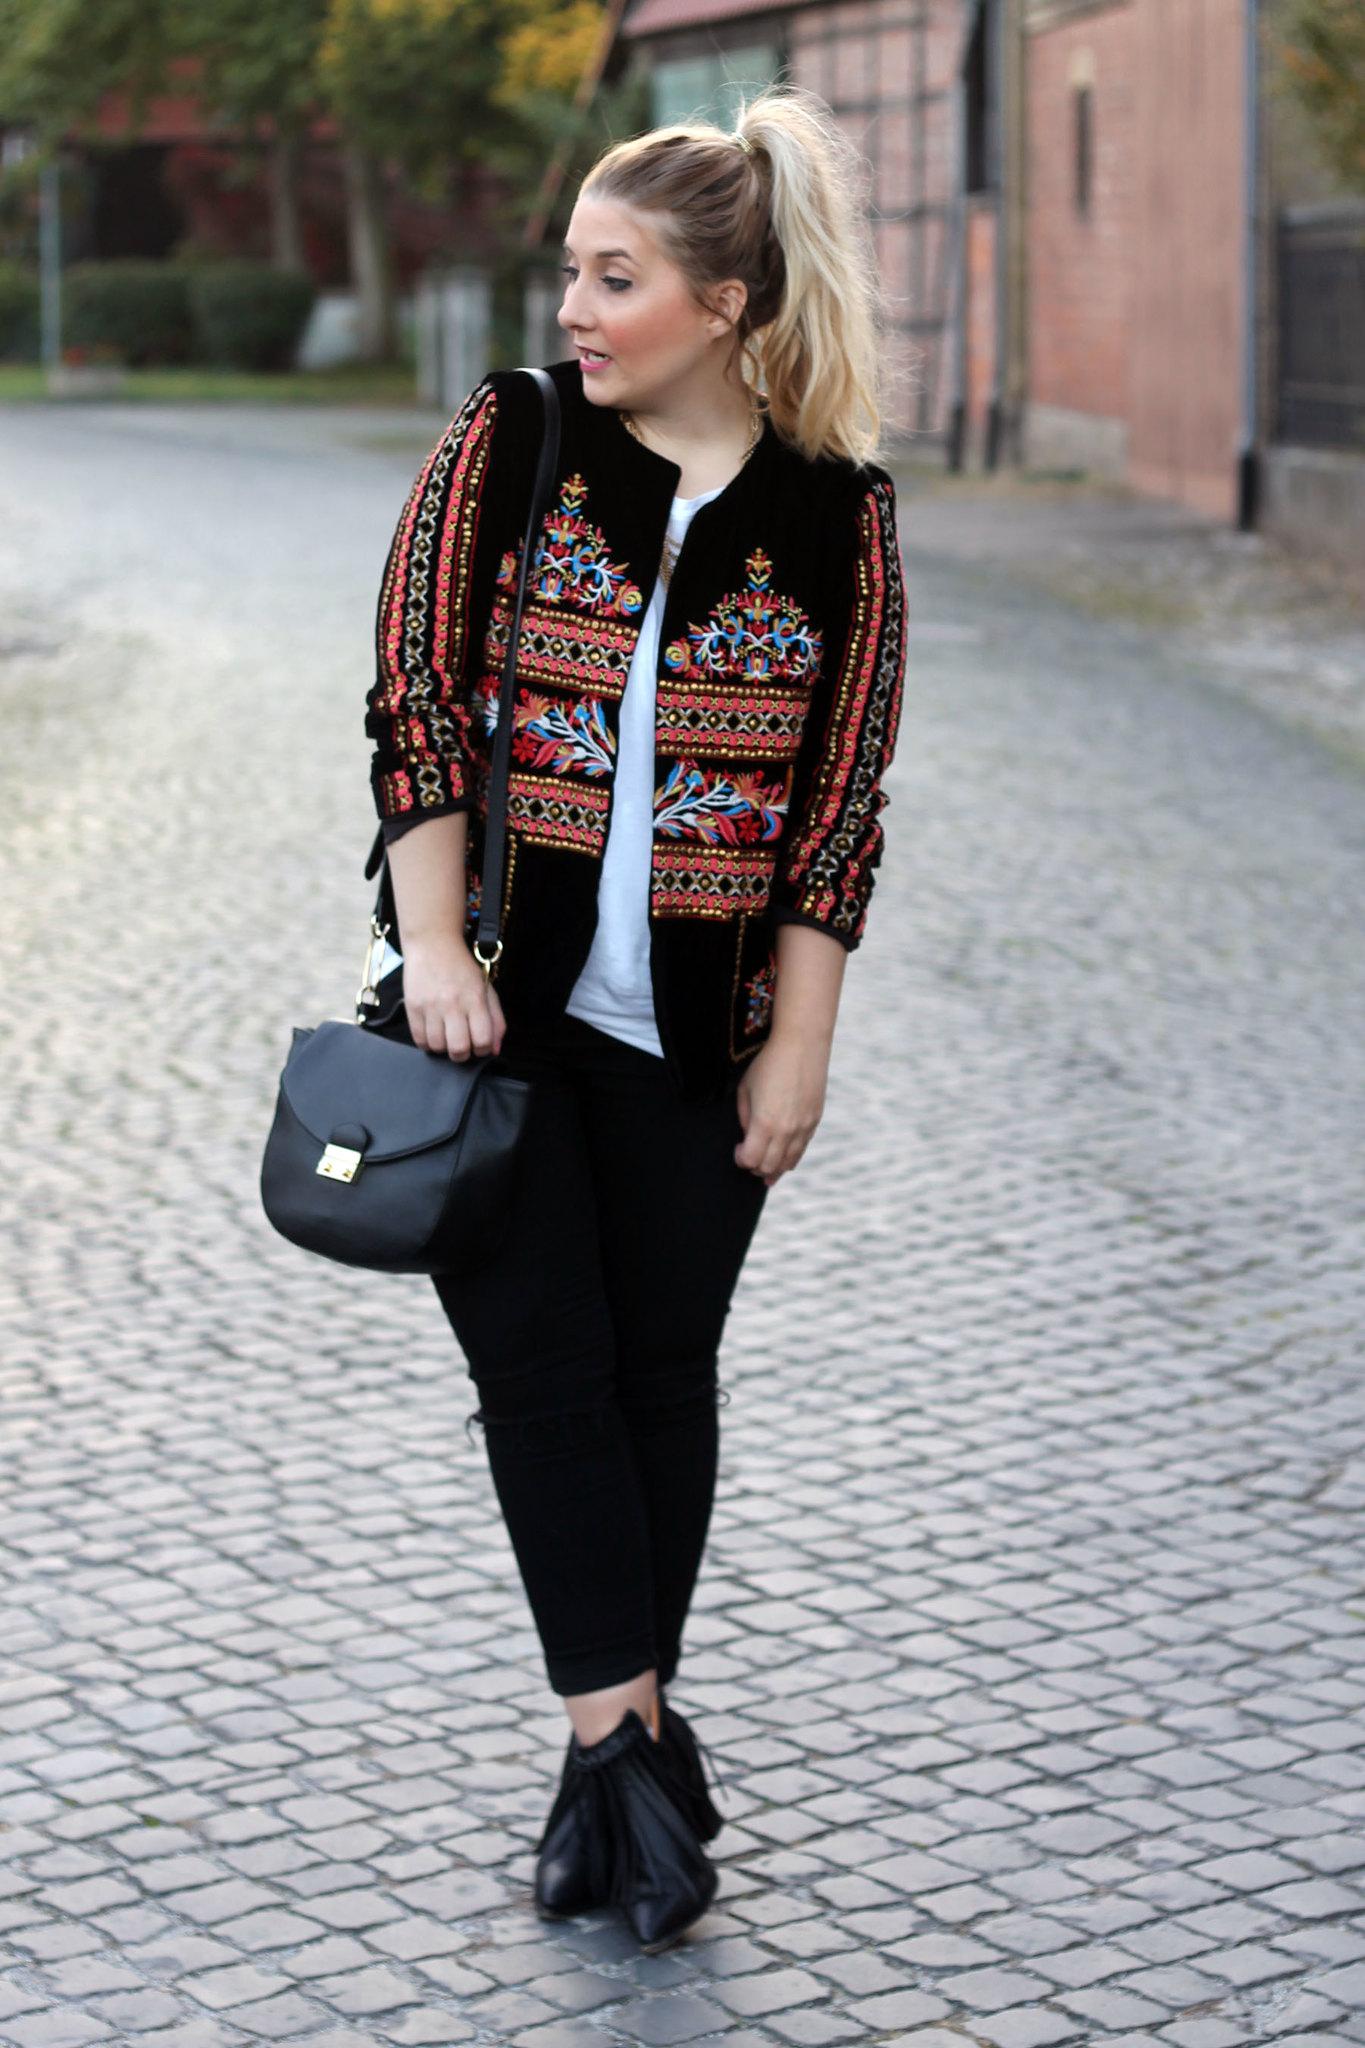 modeblog-fashionblog-zara-folklore-jacke-trend-berlin-hamburg-top